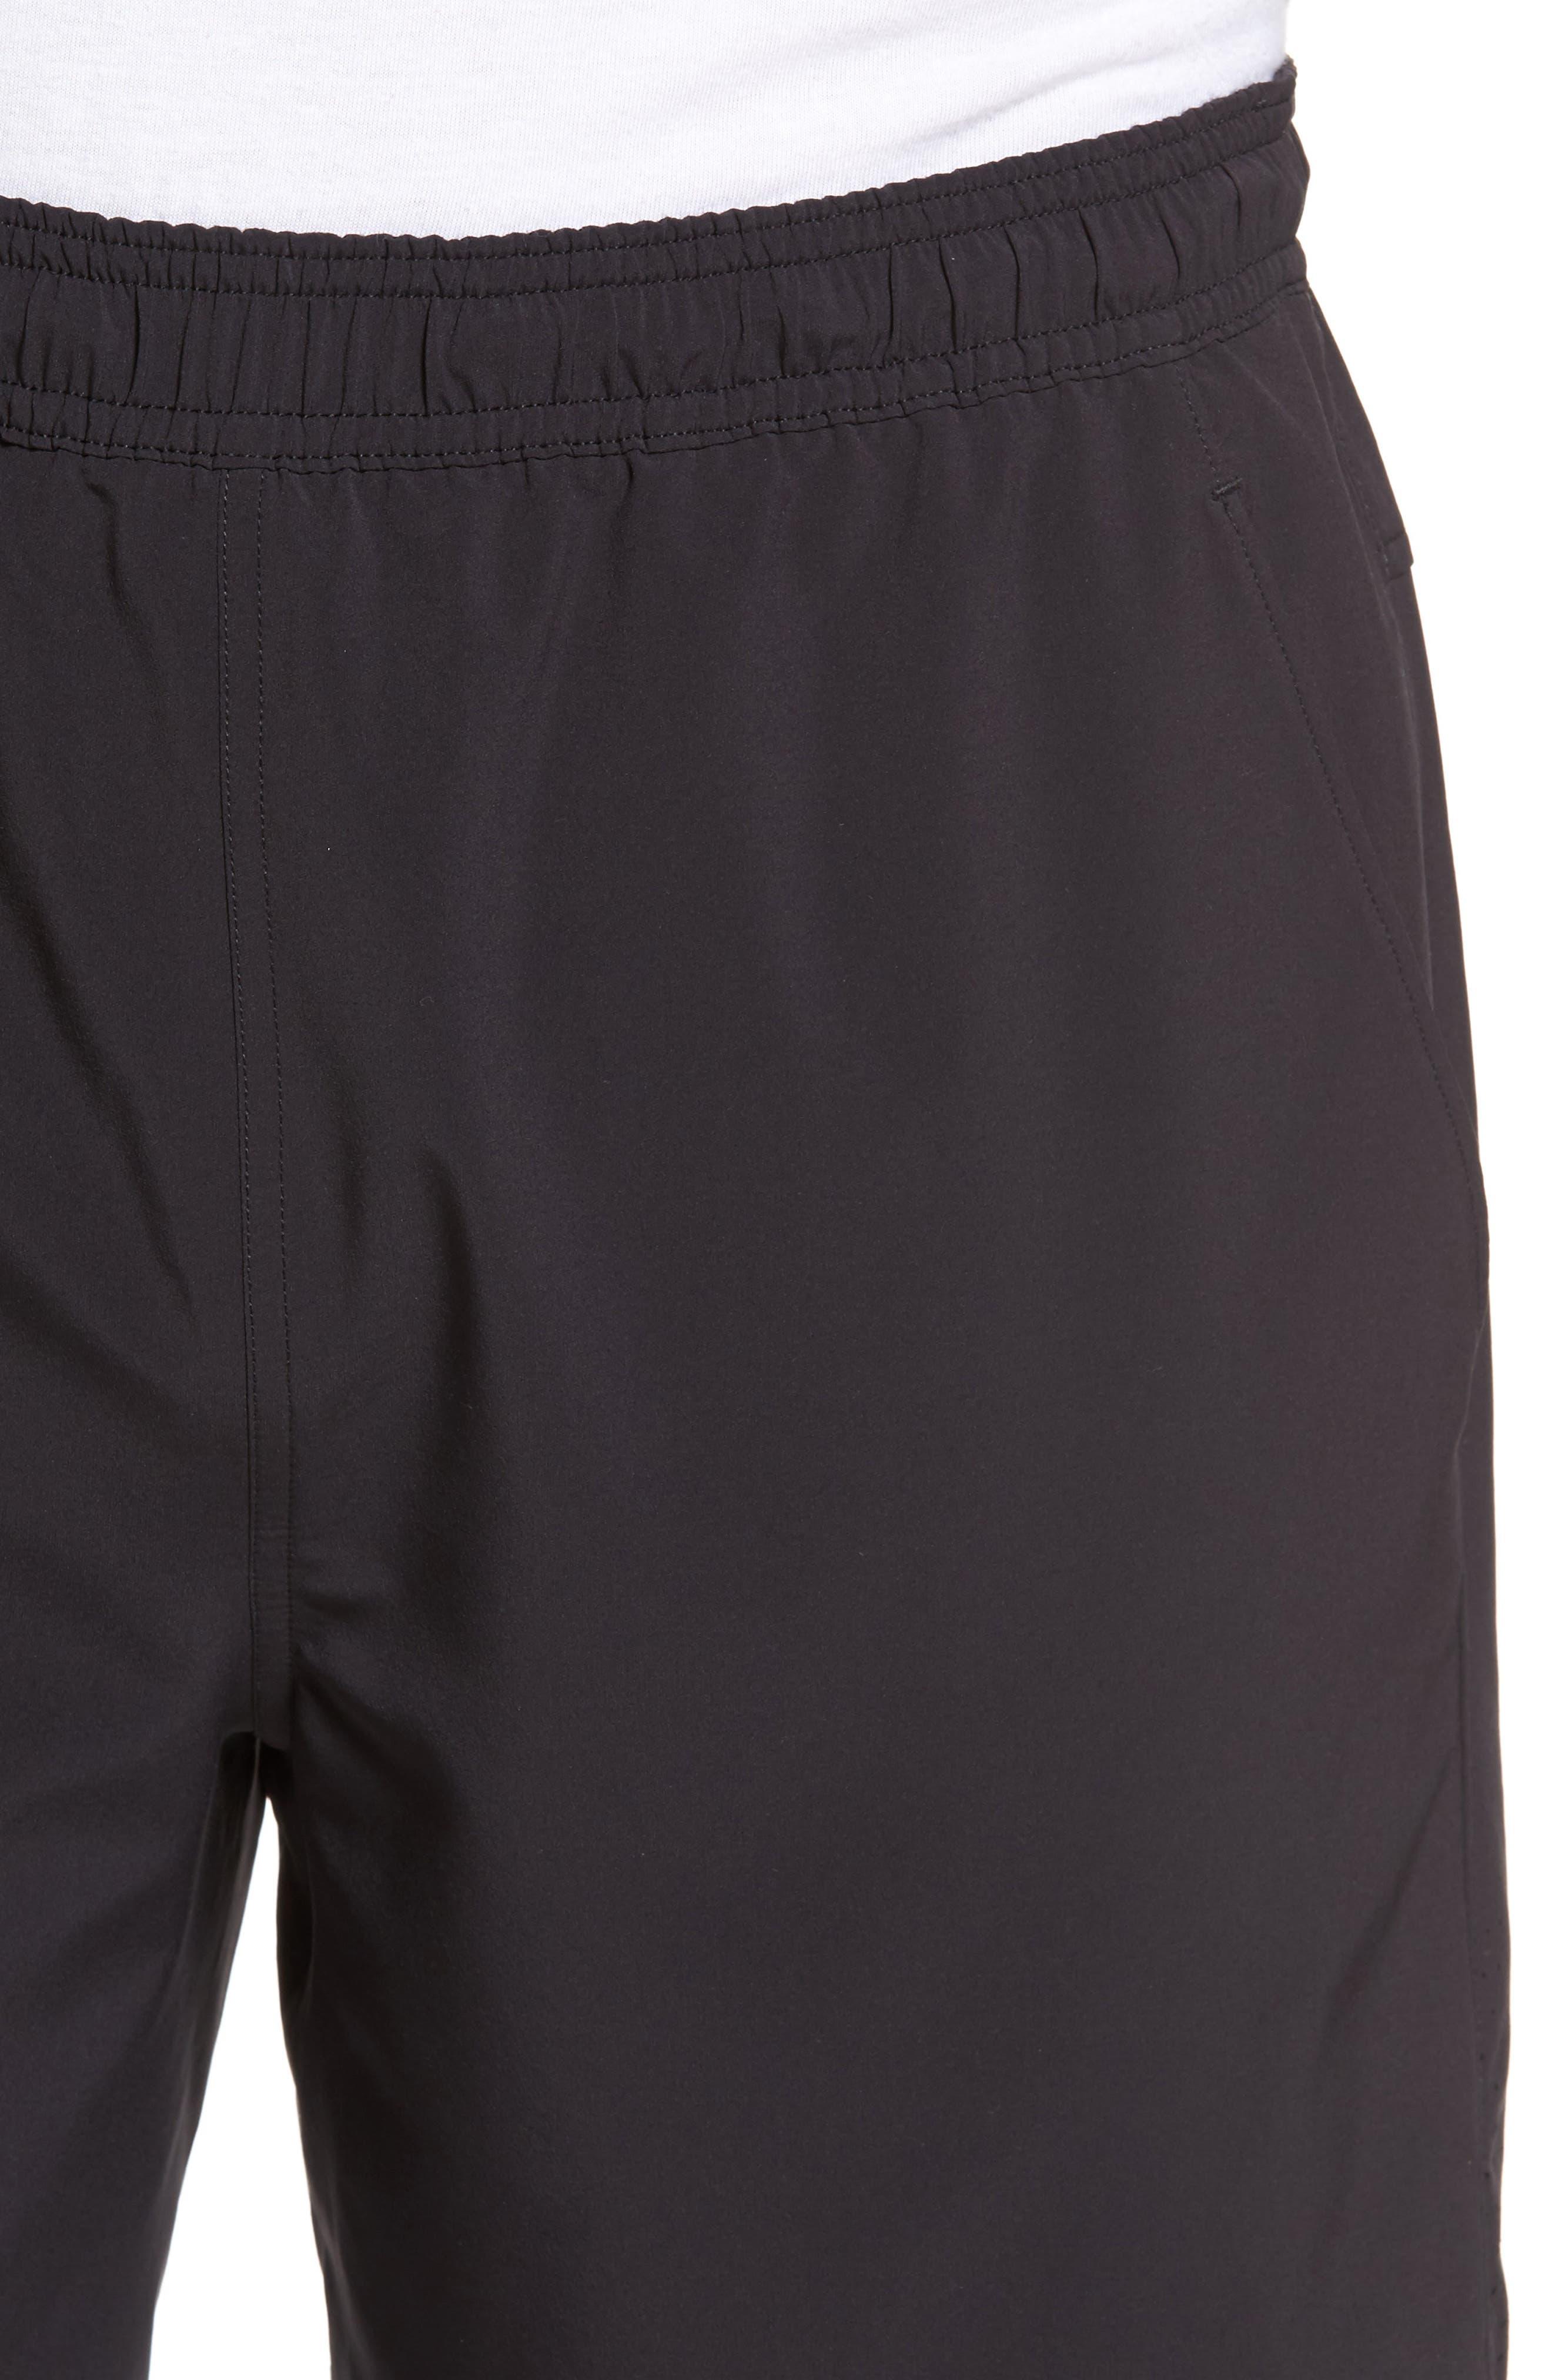 Graphite Core Athletic Shorts,                             Alternate thumbnail 4, color,                             BLACK